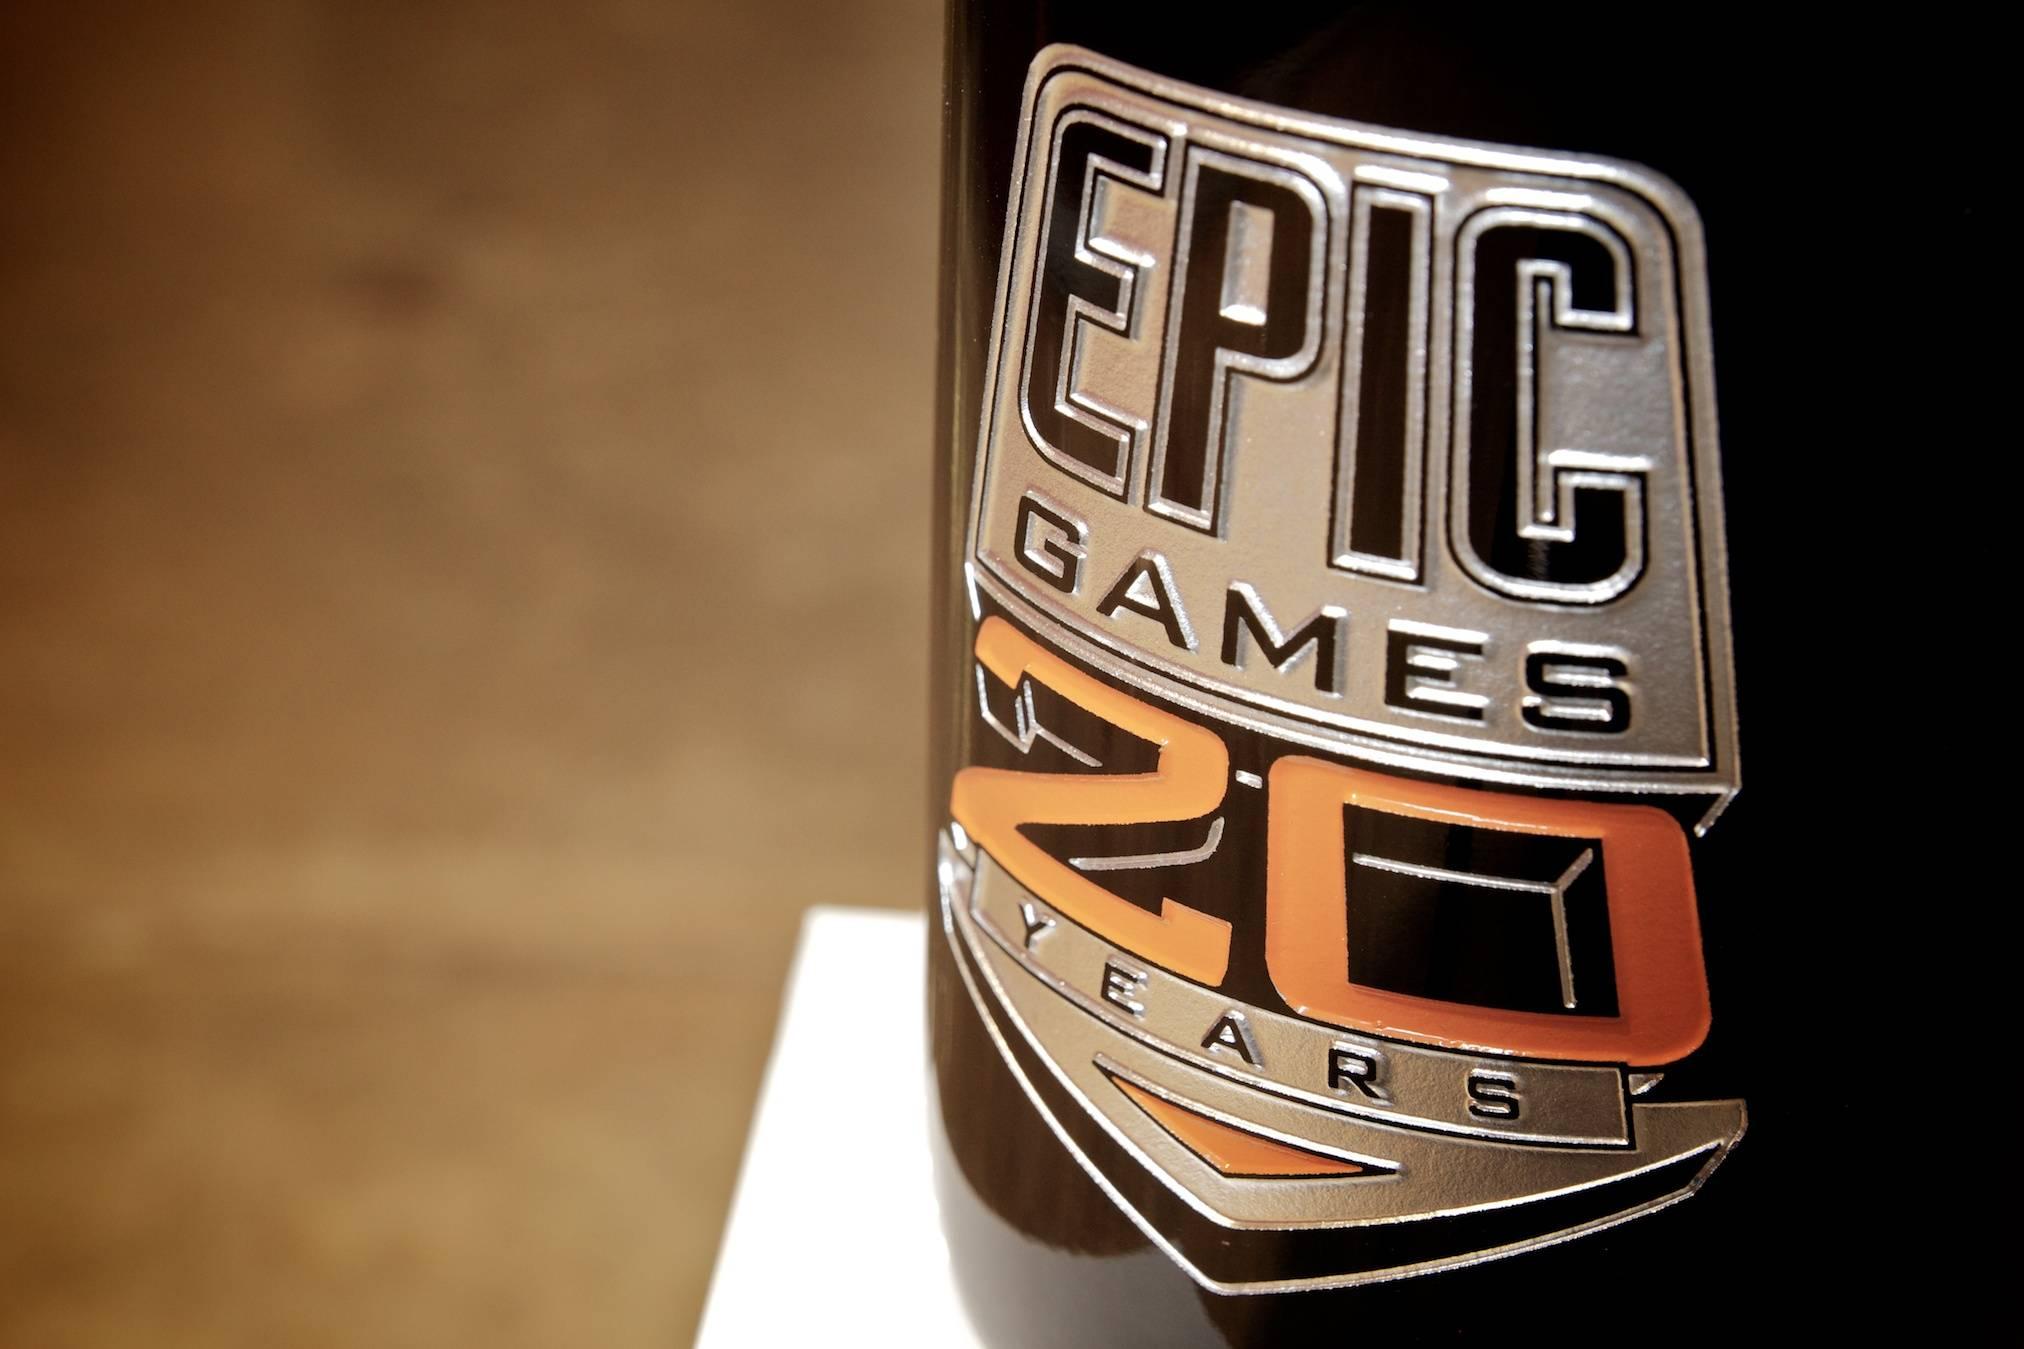 epic games - photo #19